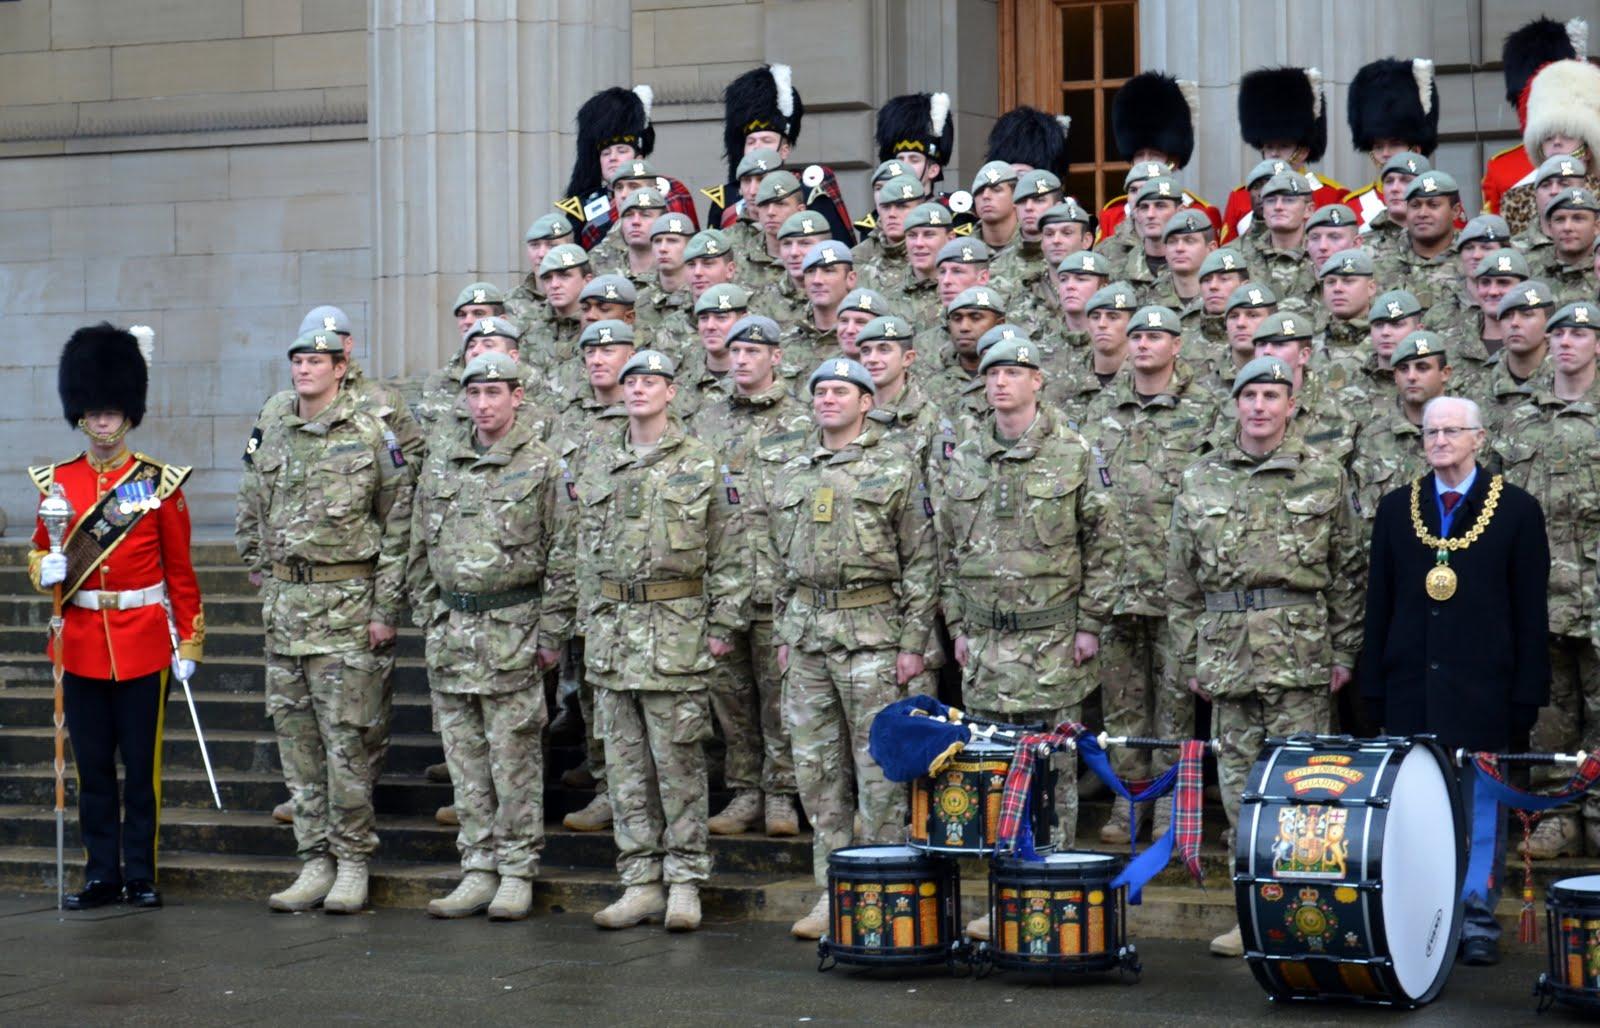 http://2.bp.blogspot.com/-PQ6BG3cEk1g/TtUxtZPhCAI/AAAAAAAAr1k/XY_Cb8cGvhk/s1600/Tour+Scotland+Photograph+Royal+Scots+Dragoon+Guards+And+Lord+Provost+City+Square+Dundee+Scotland+November+29th.jpg